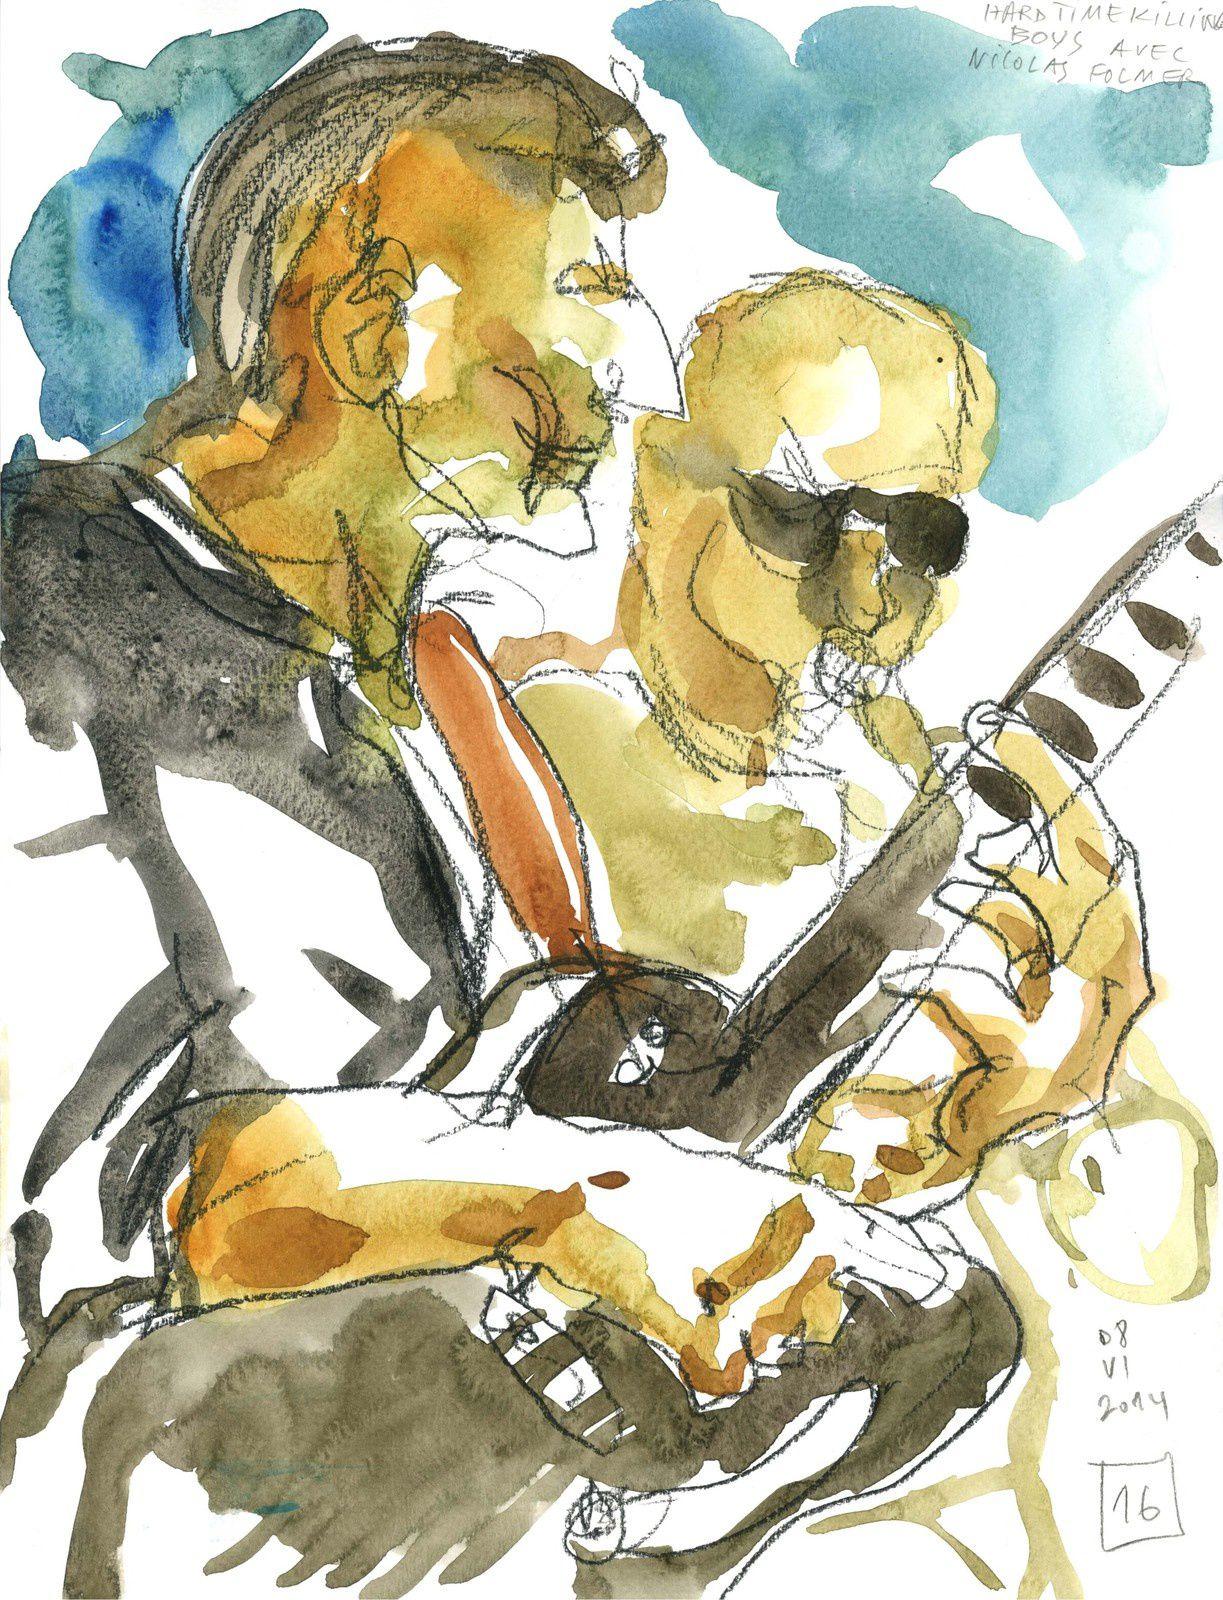 A la fin du concert Nicolas Folmer tape le boeuf bluesy avec les fondus du bayou, YEEEAAHH!